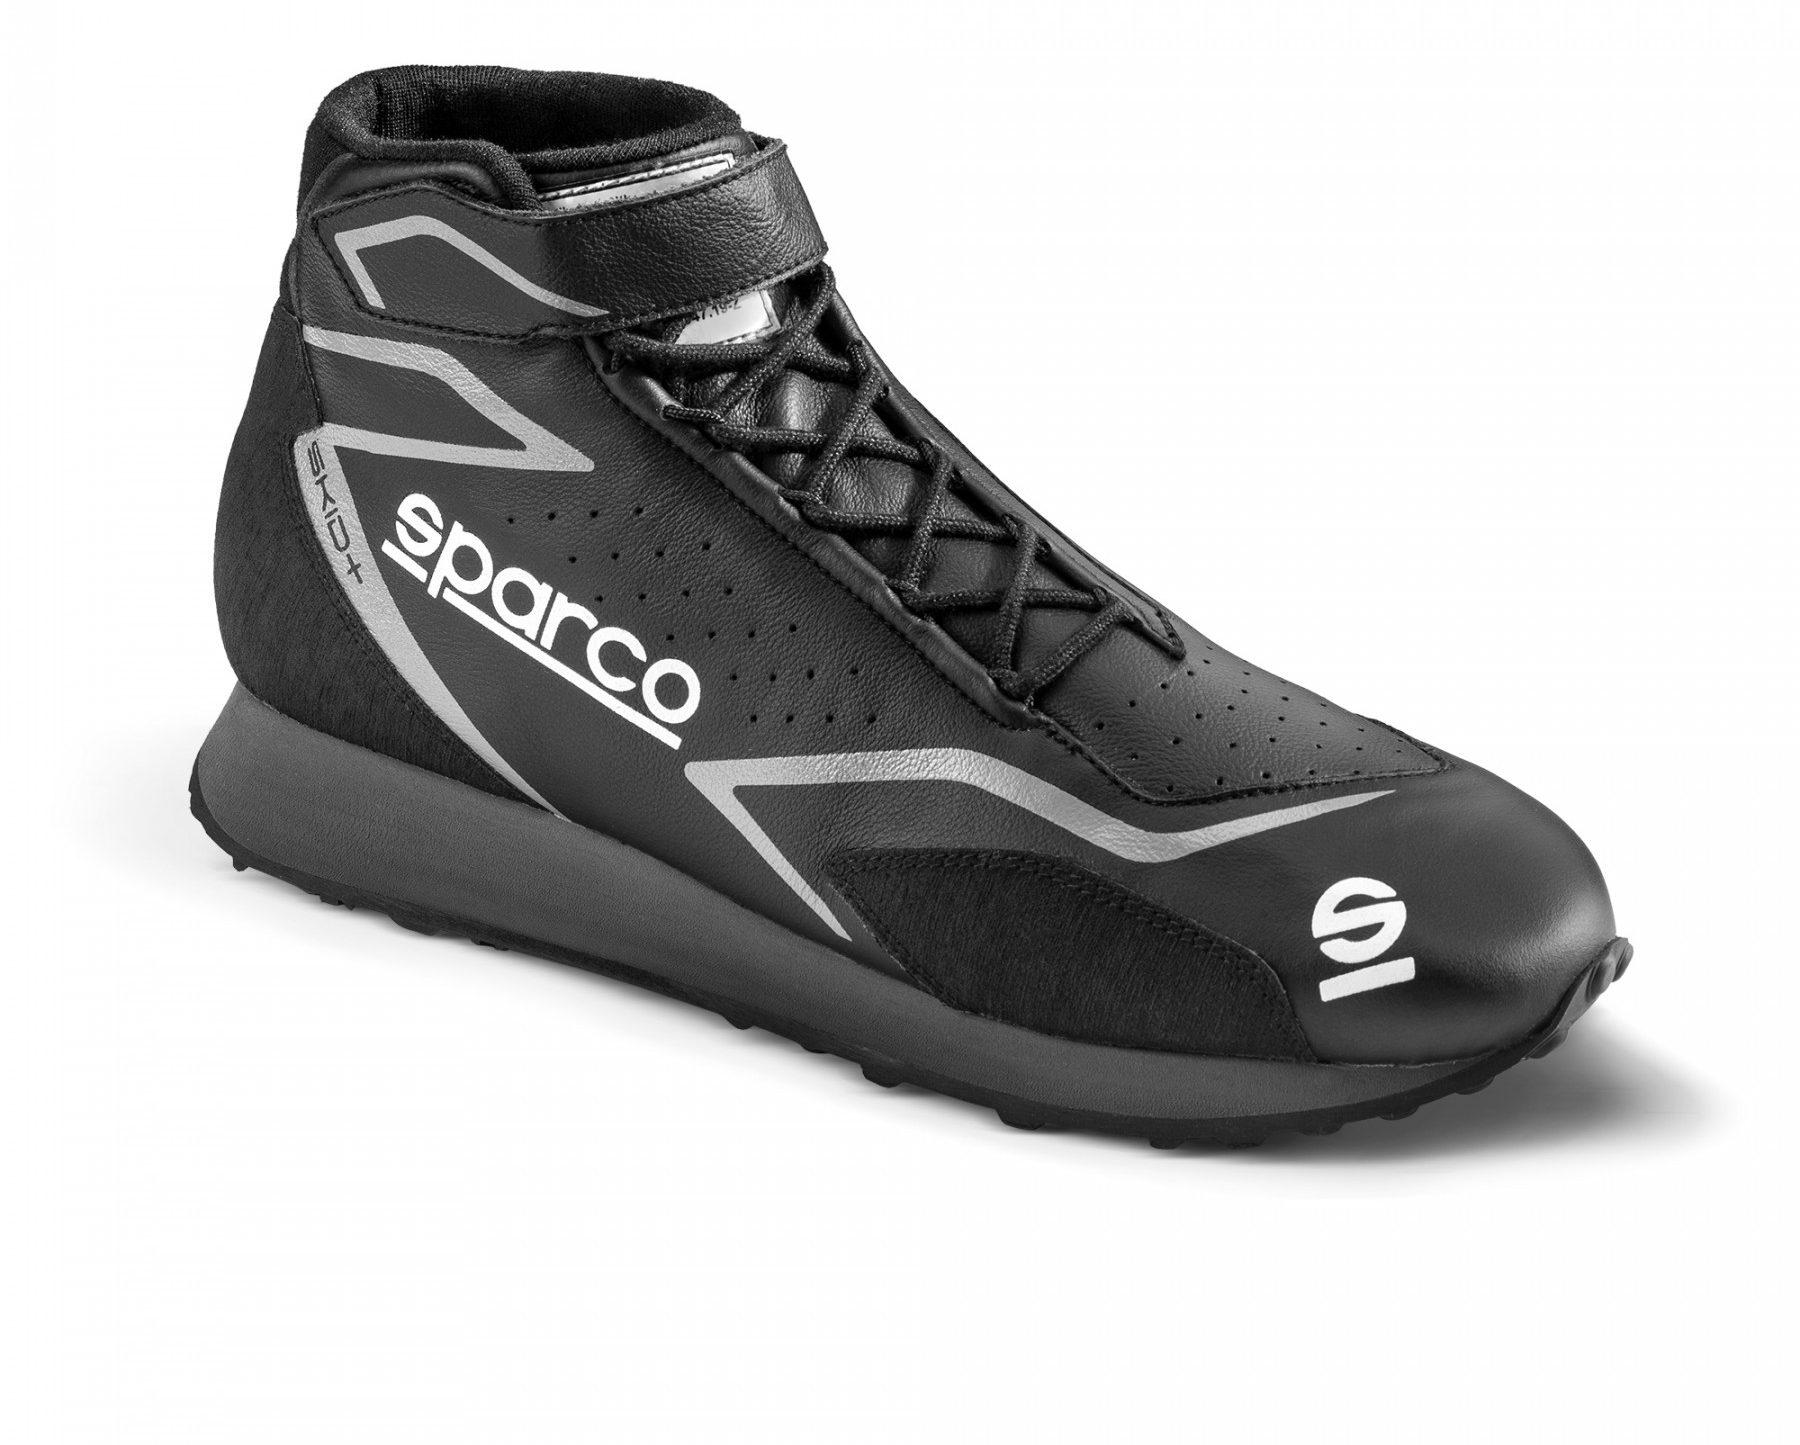 Нов продукт: Sparco Skid+, FIA Shoes